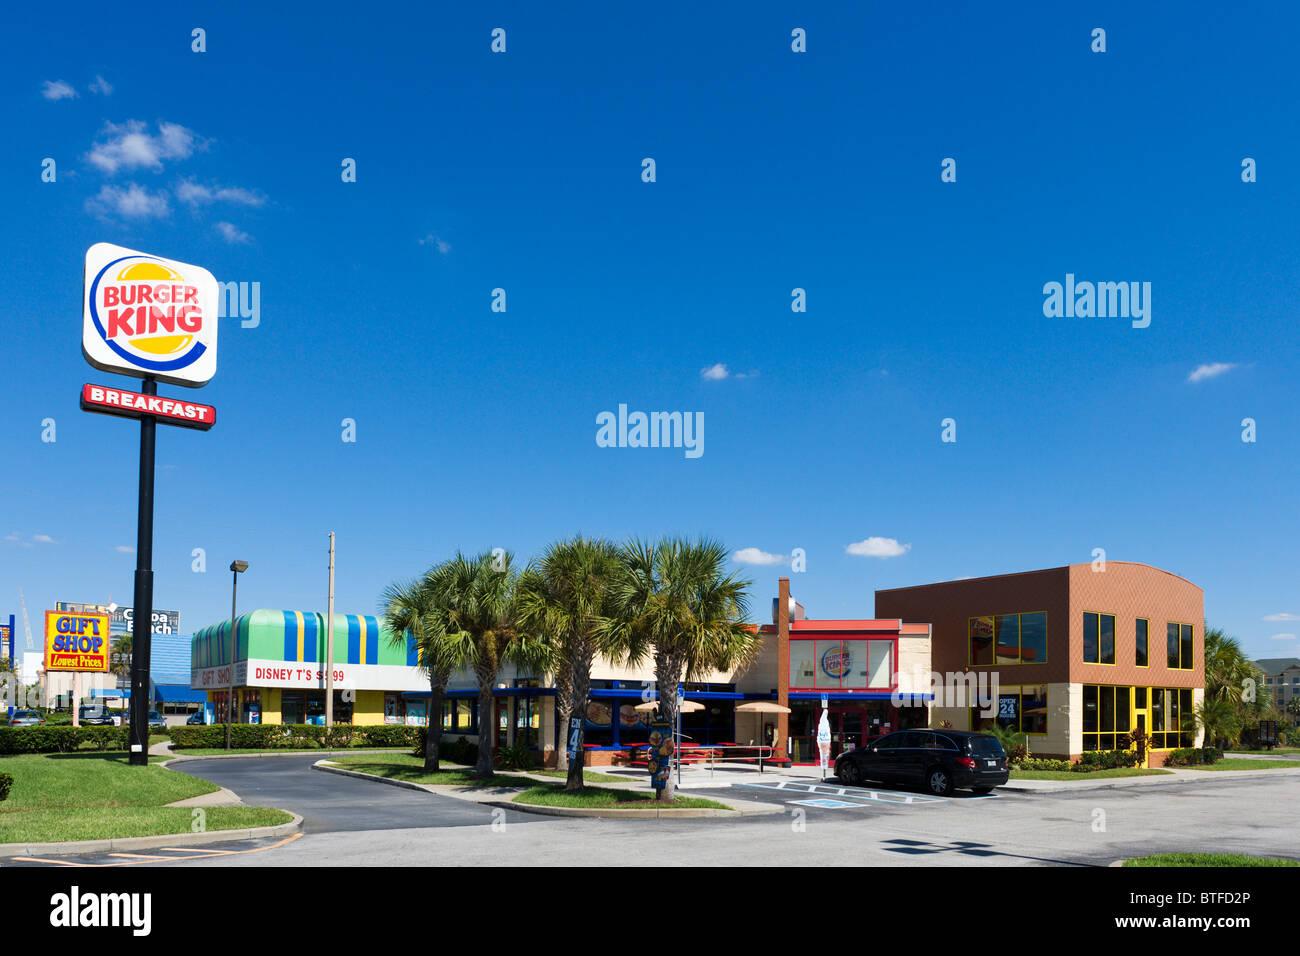 Burger King Fast Food Restaurant On International Drive